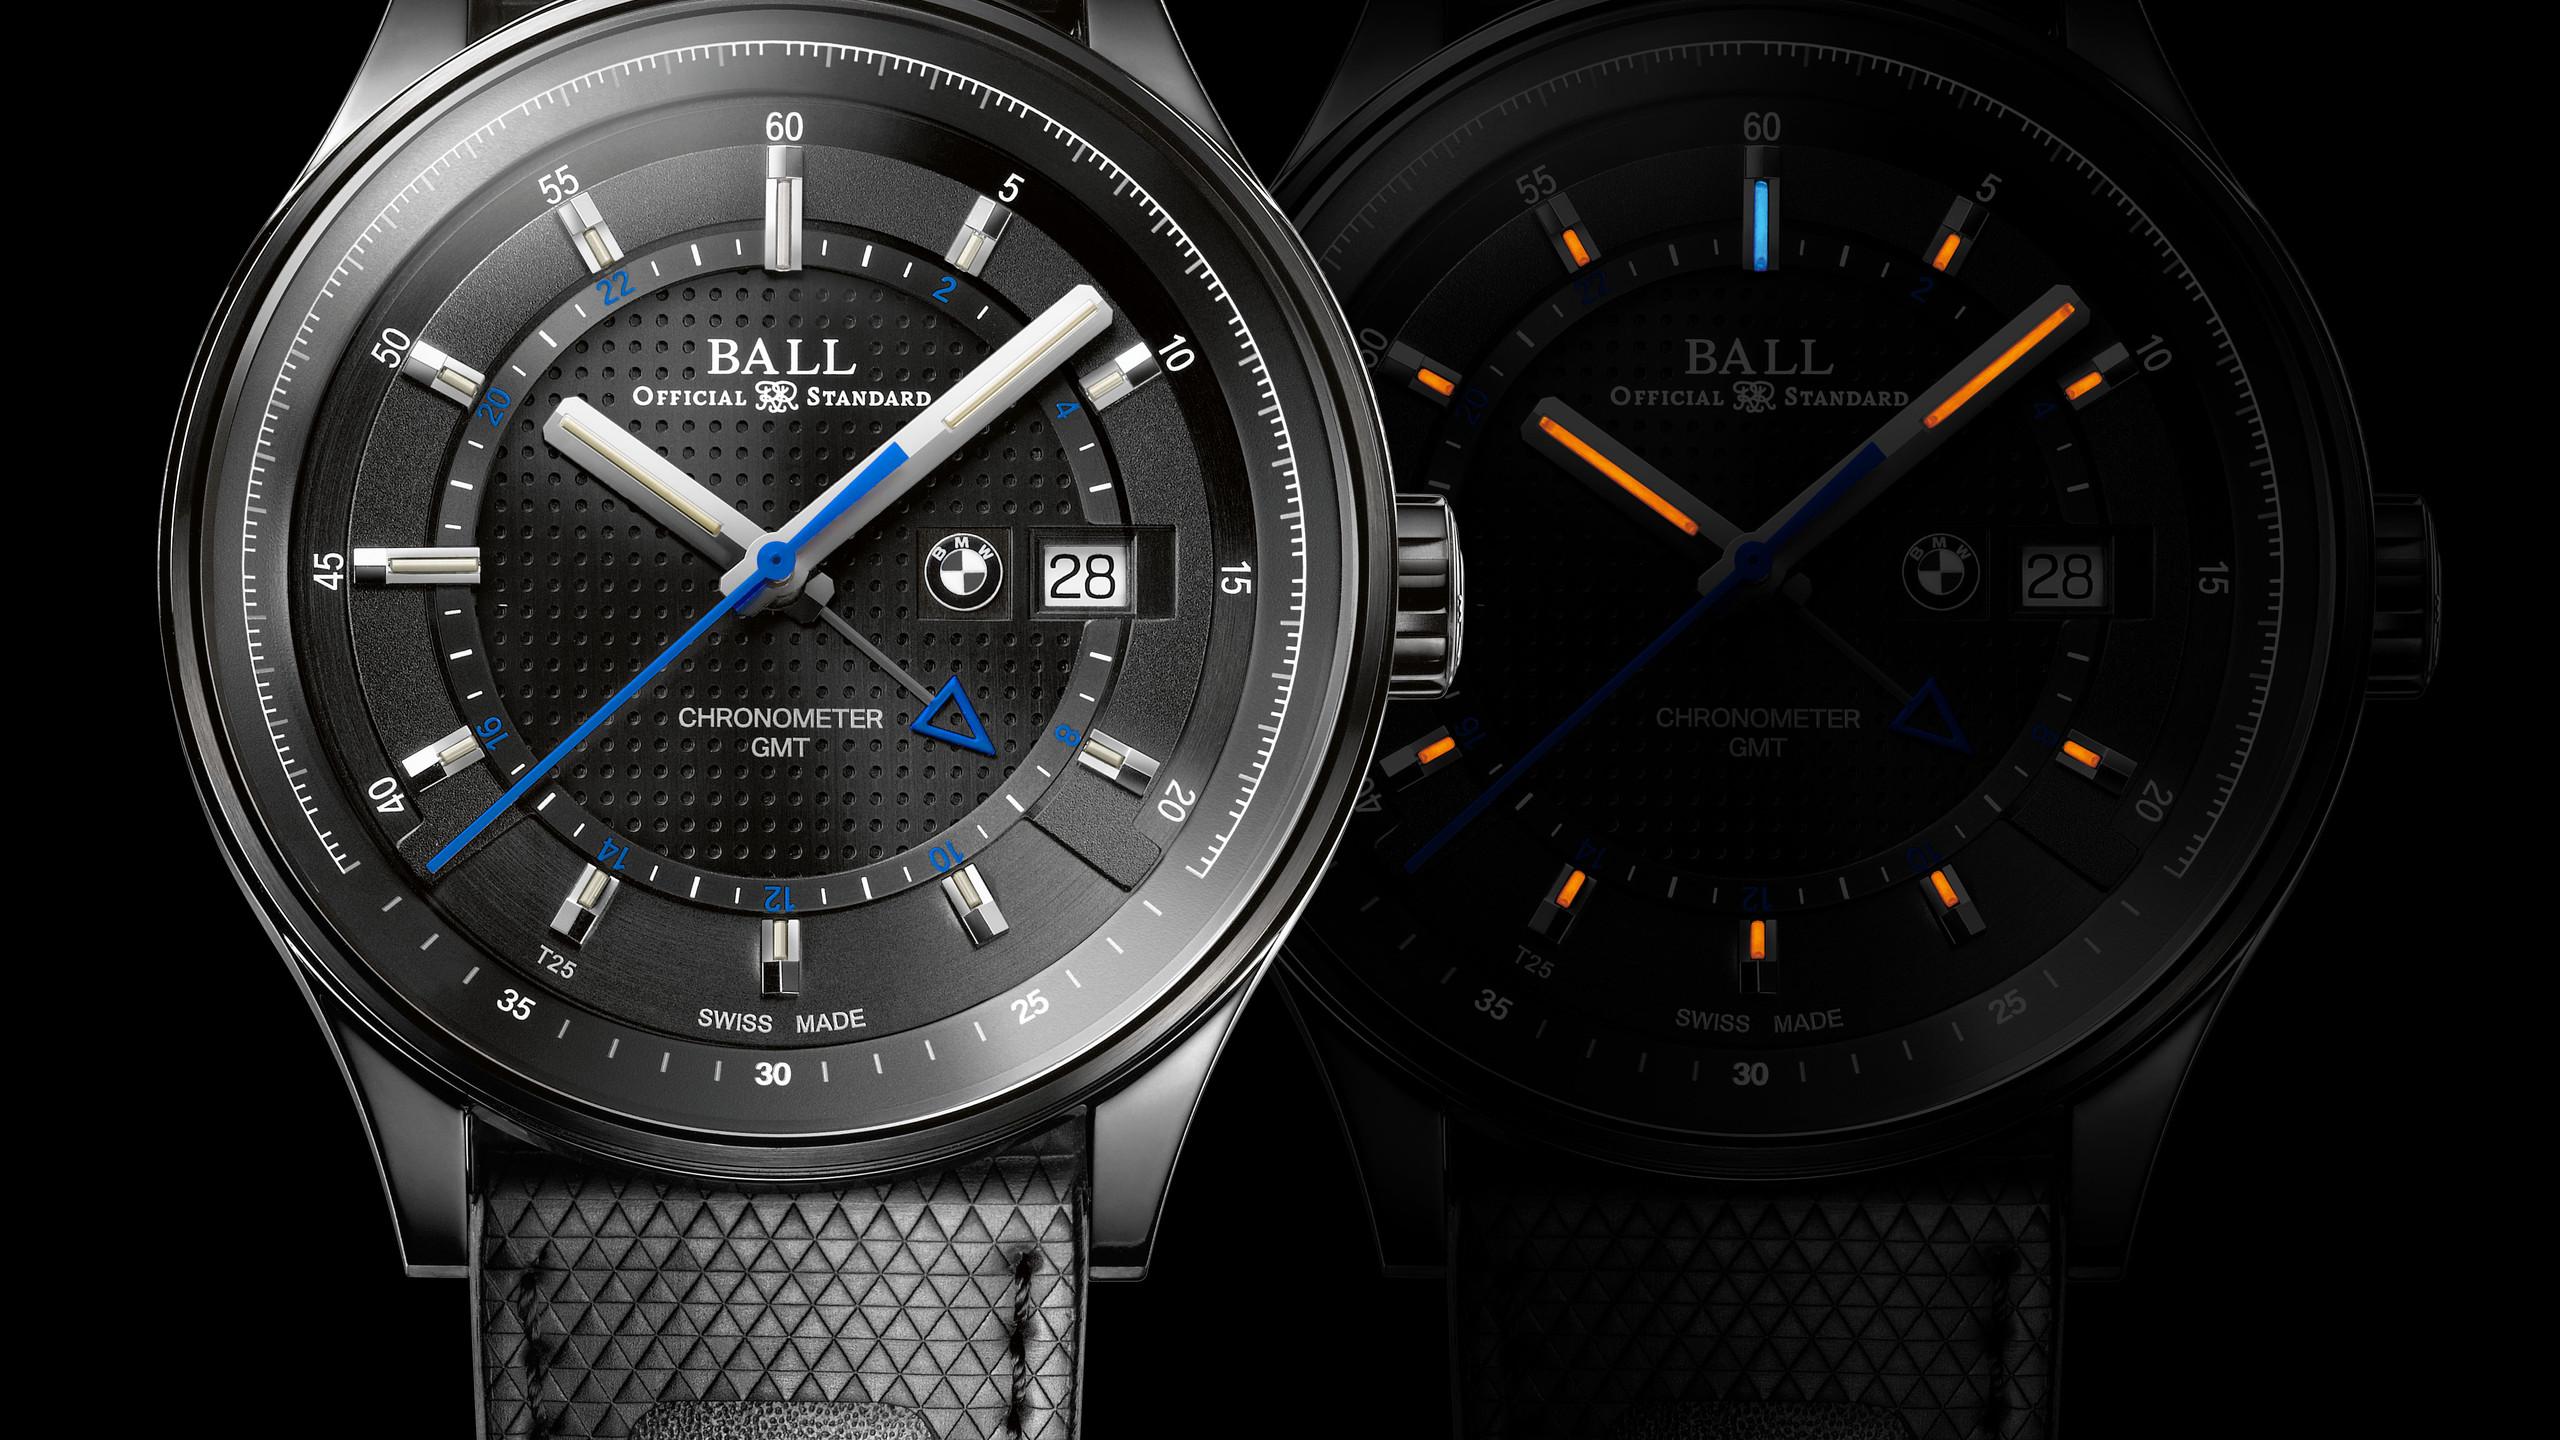 BALL FOR BMW GMT CHRONOMETER